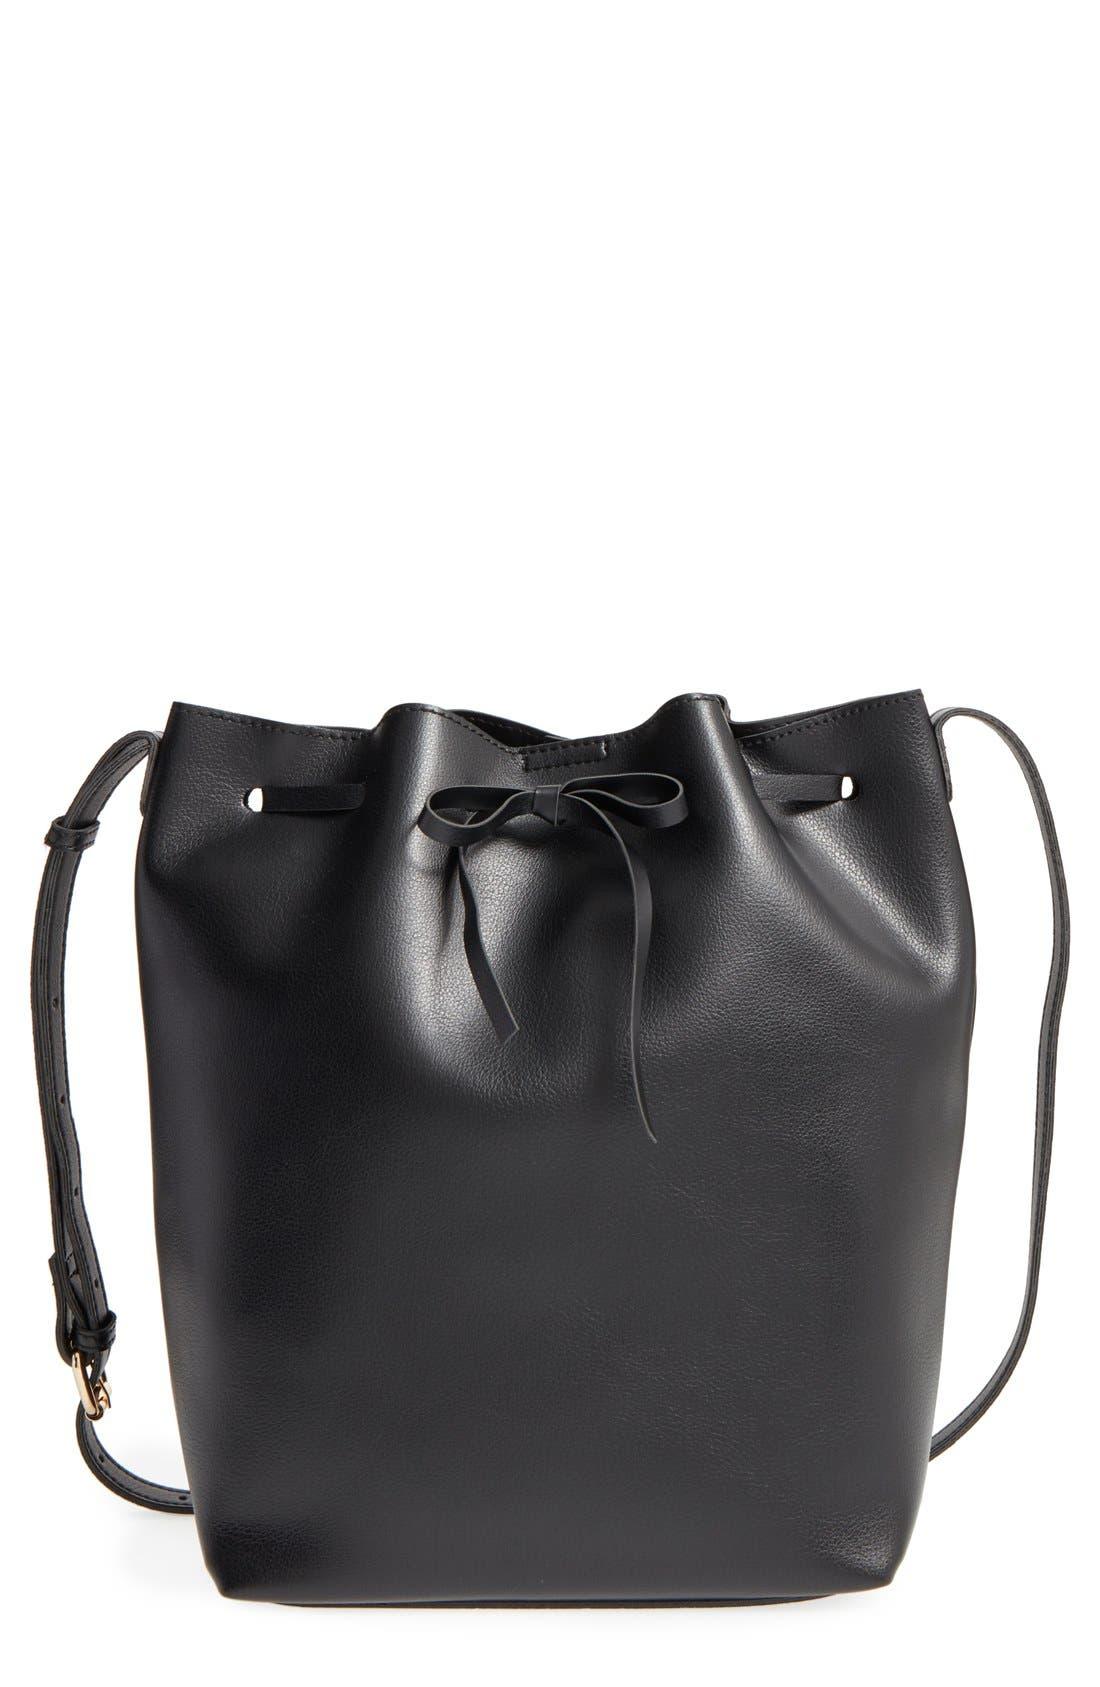 SOLE SOCIETY,                             'Blackwood' Faux Leather Bucket Bag,                             Main thumbnail 1, color,                             001